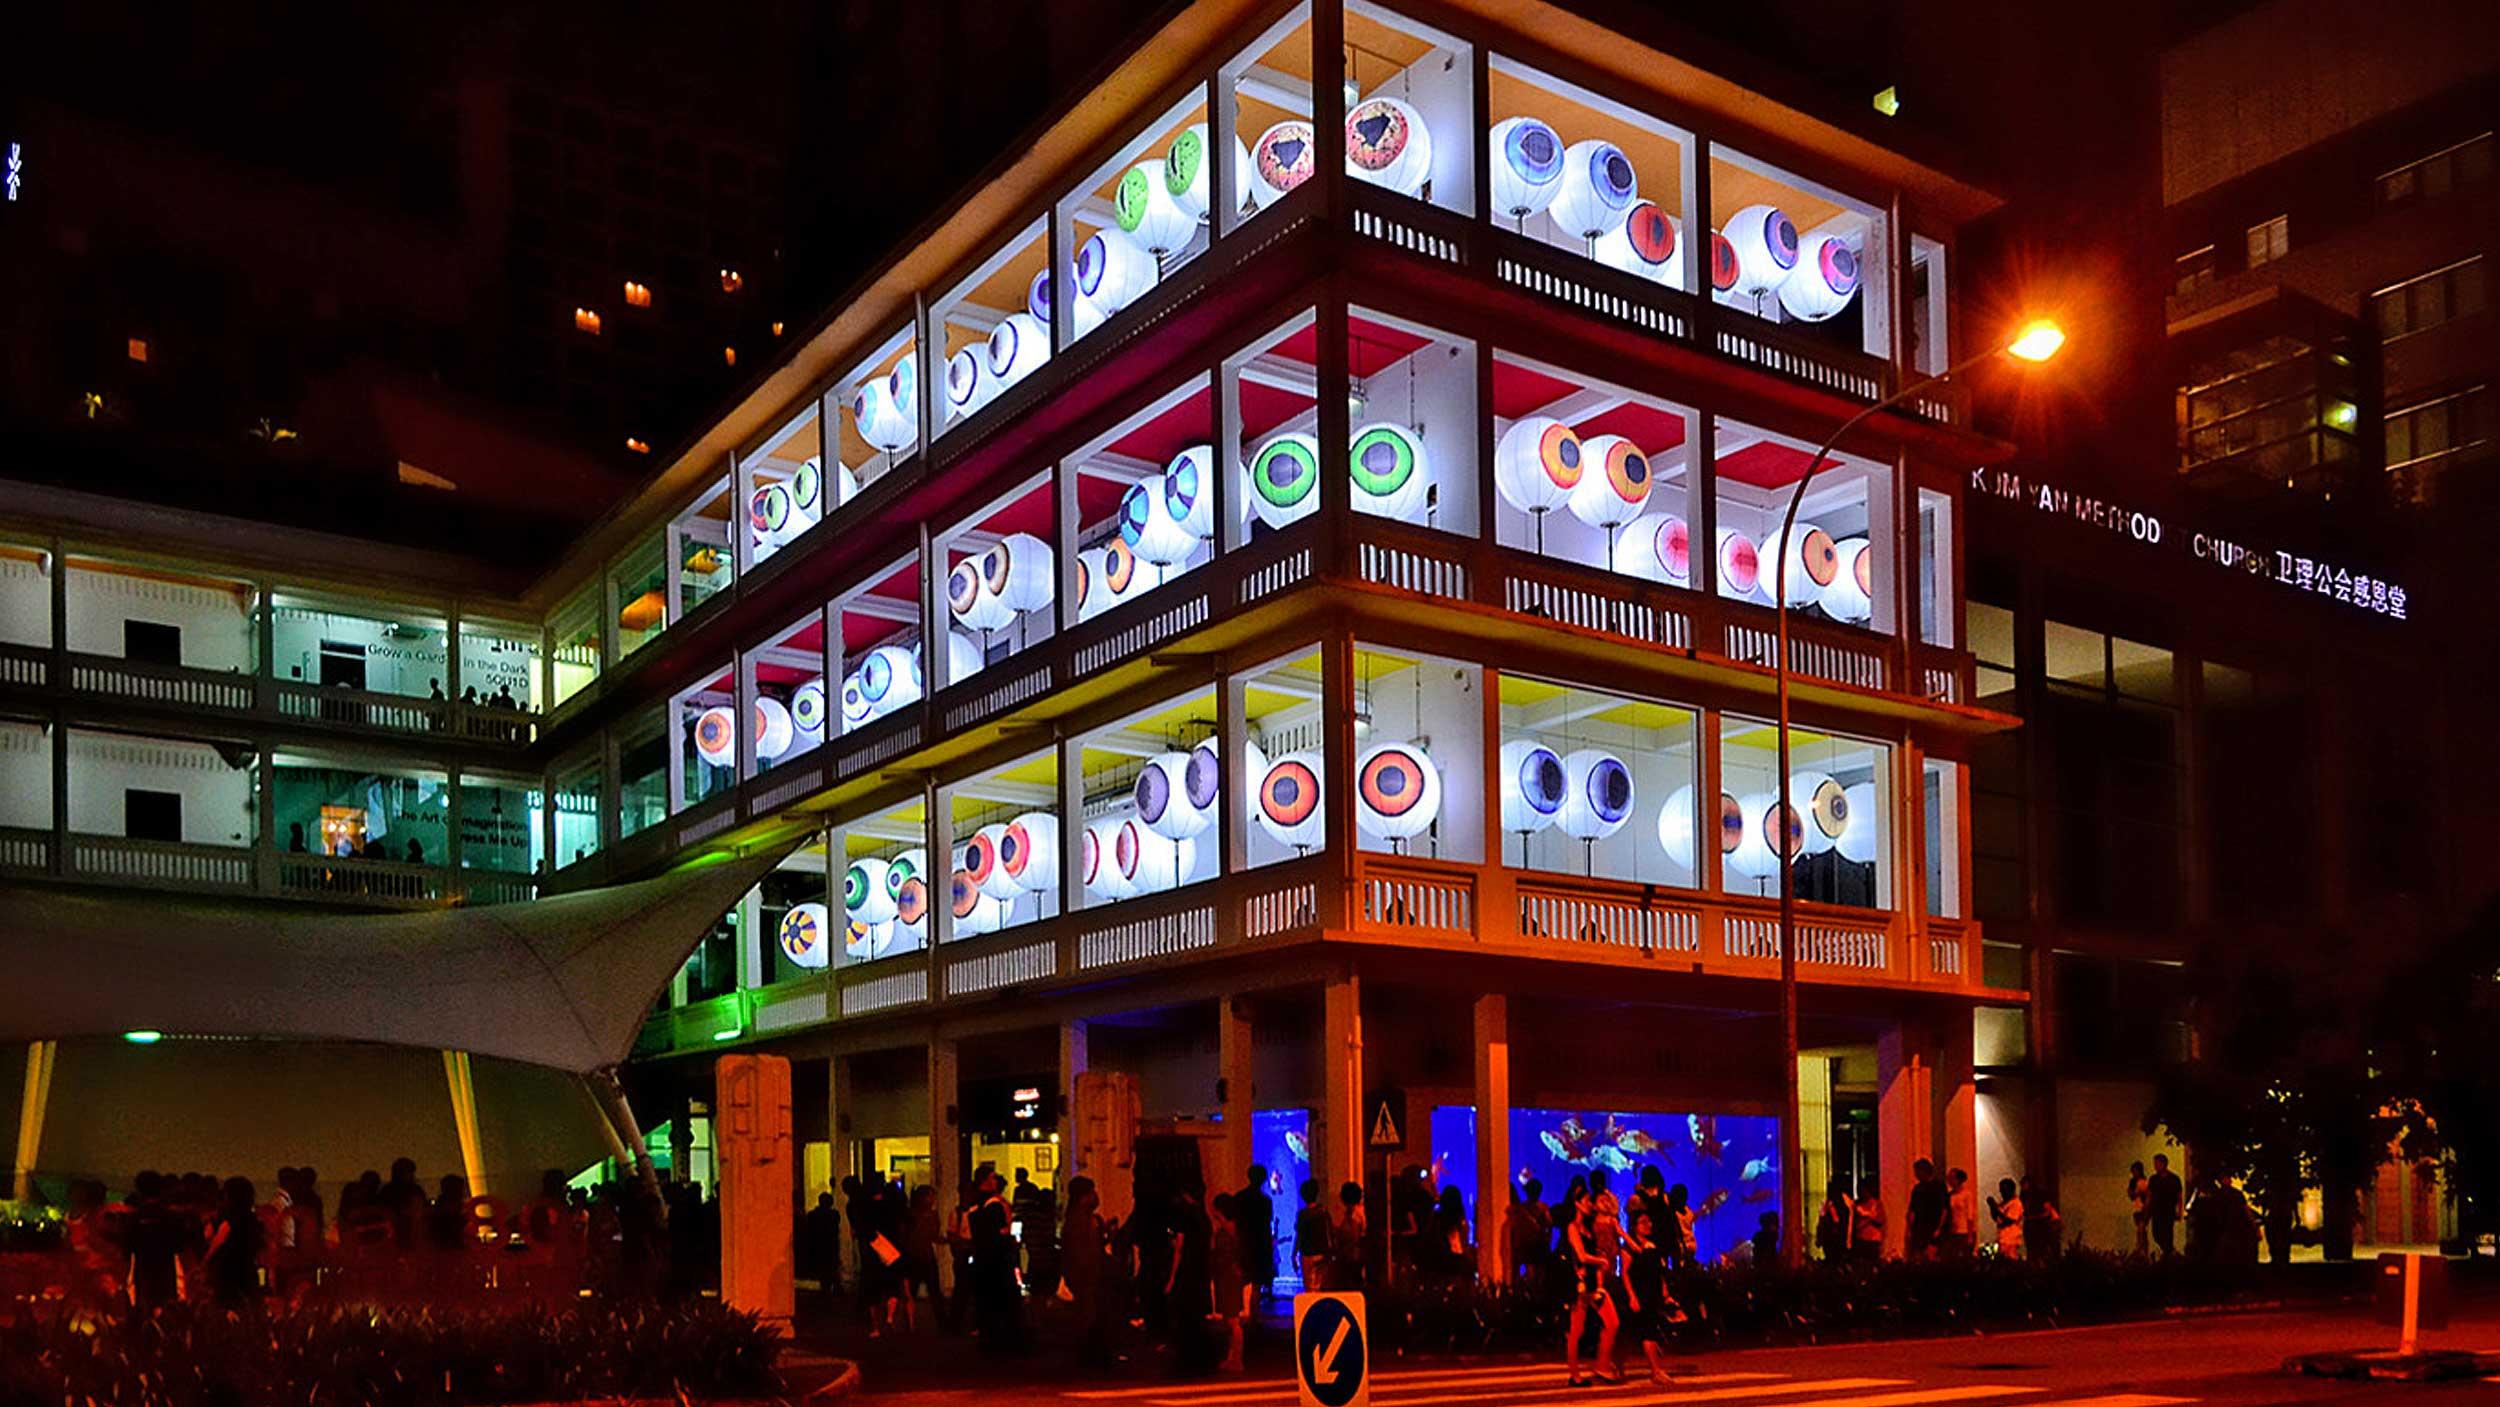 WOKrea_NIGHT_WATCH_SINGAPORE_02.jpg